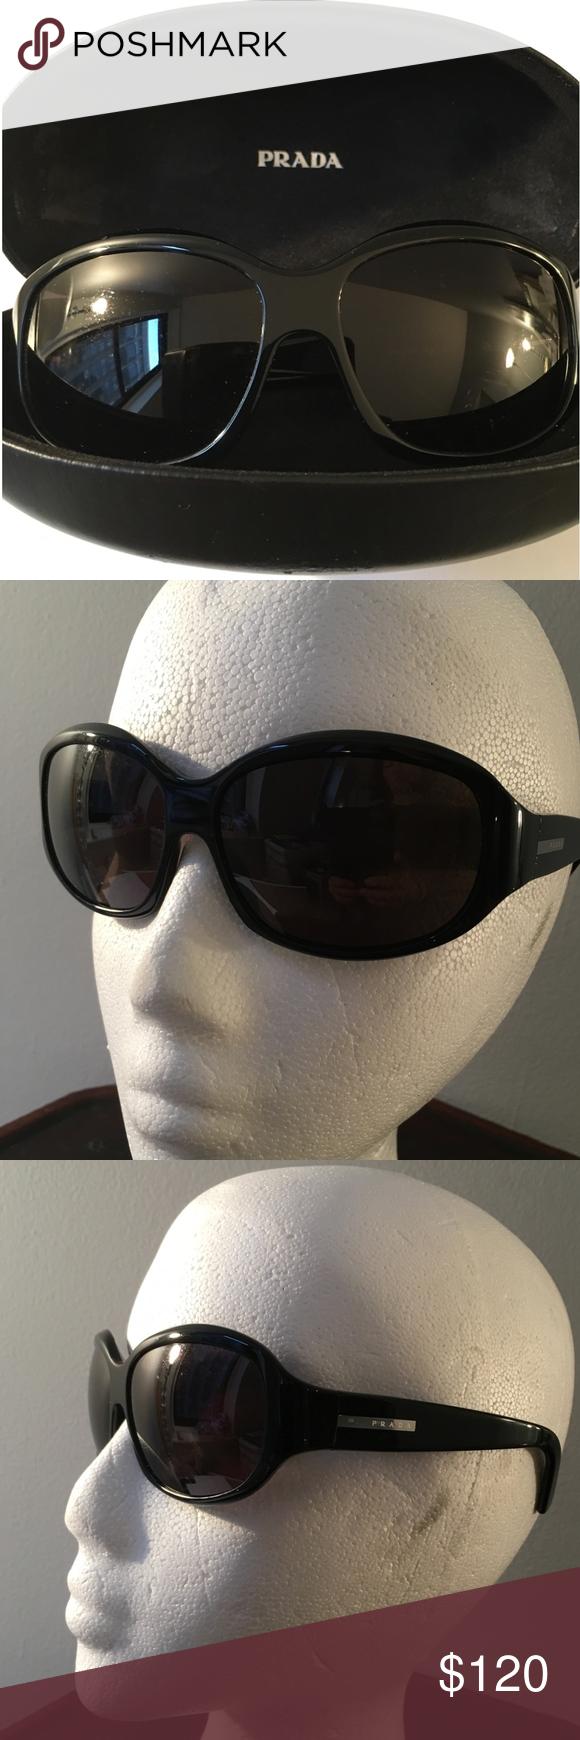 d24576997b1 PRADA Sunglasses Jett Black Prada Sunglasses with it s case. Made in Italy. Prada  Accessories Sunglasses